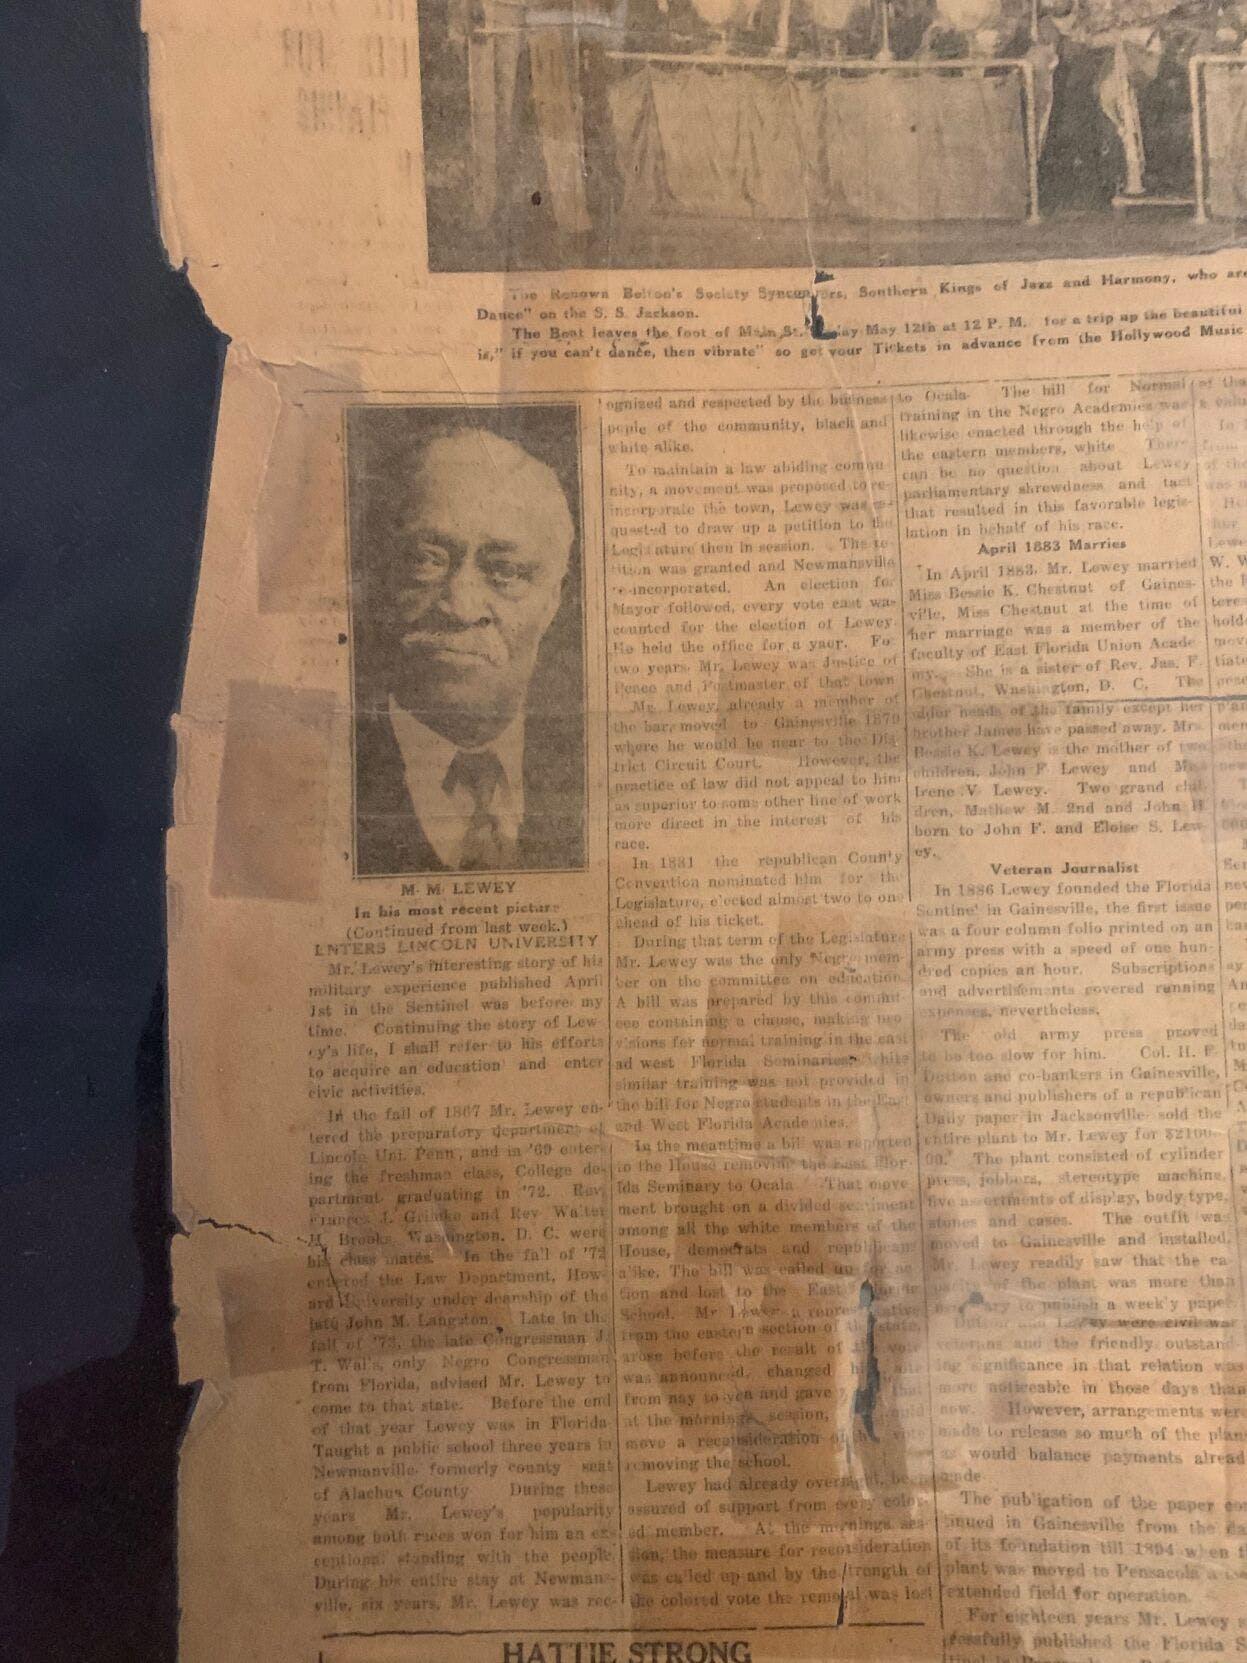 M. M. Lewey newspaper